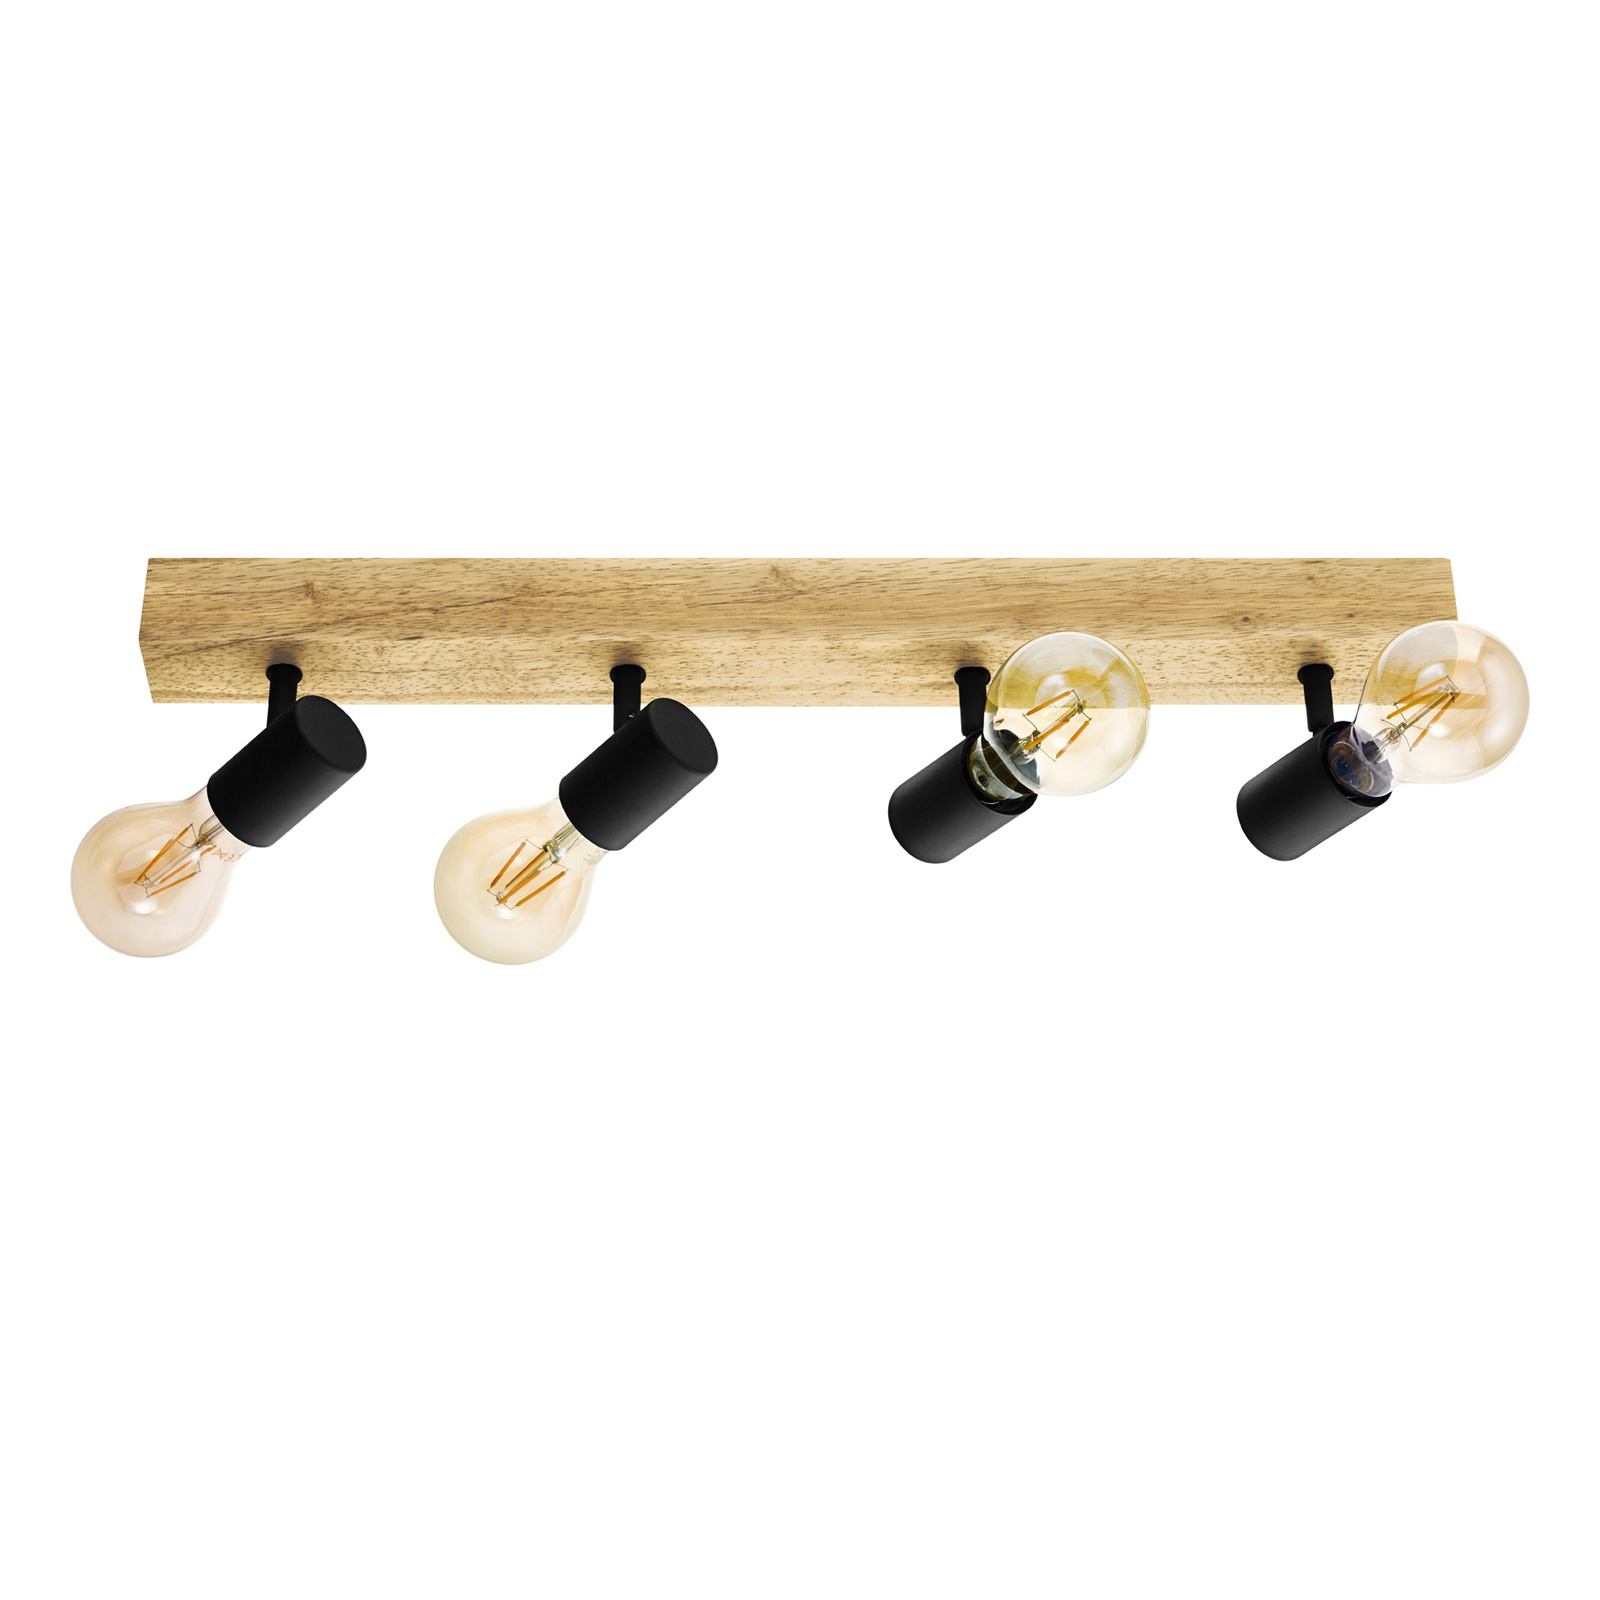 Plafondlamp Townshend 3 van hout, 4-lamps